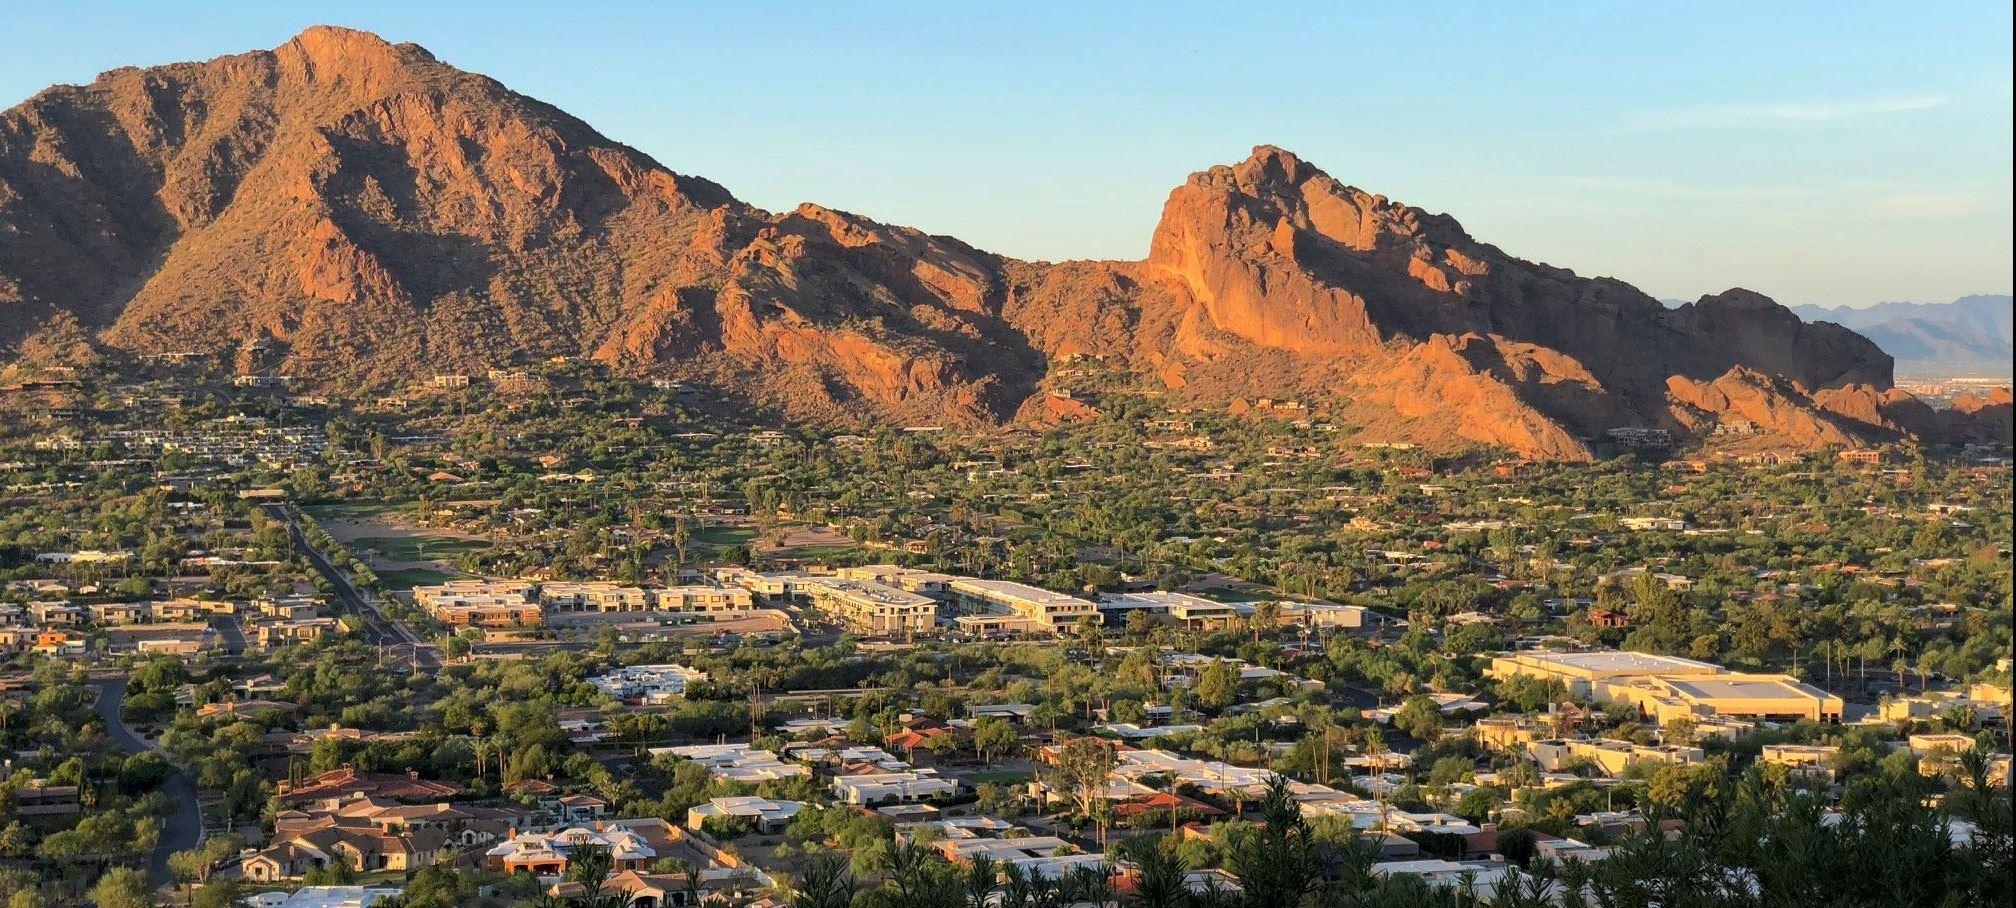 Paradise Valley, AZ - Official Website | Official Website